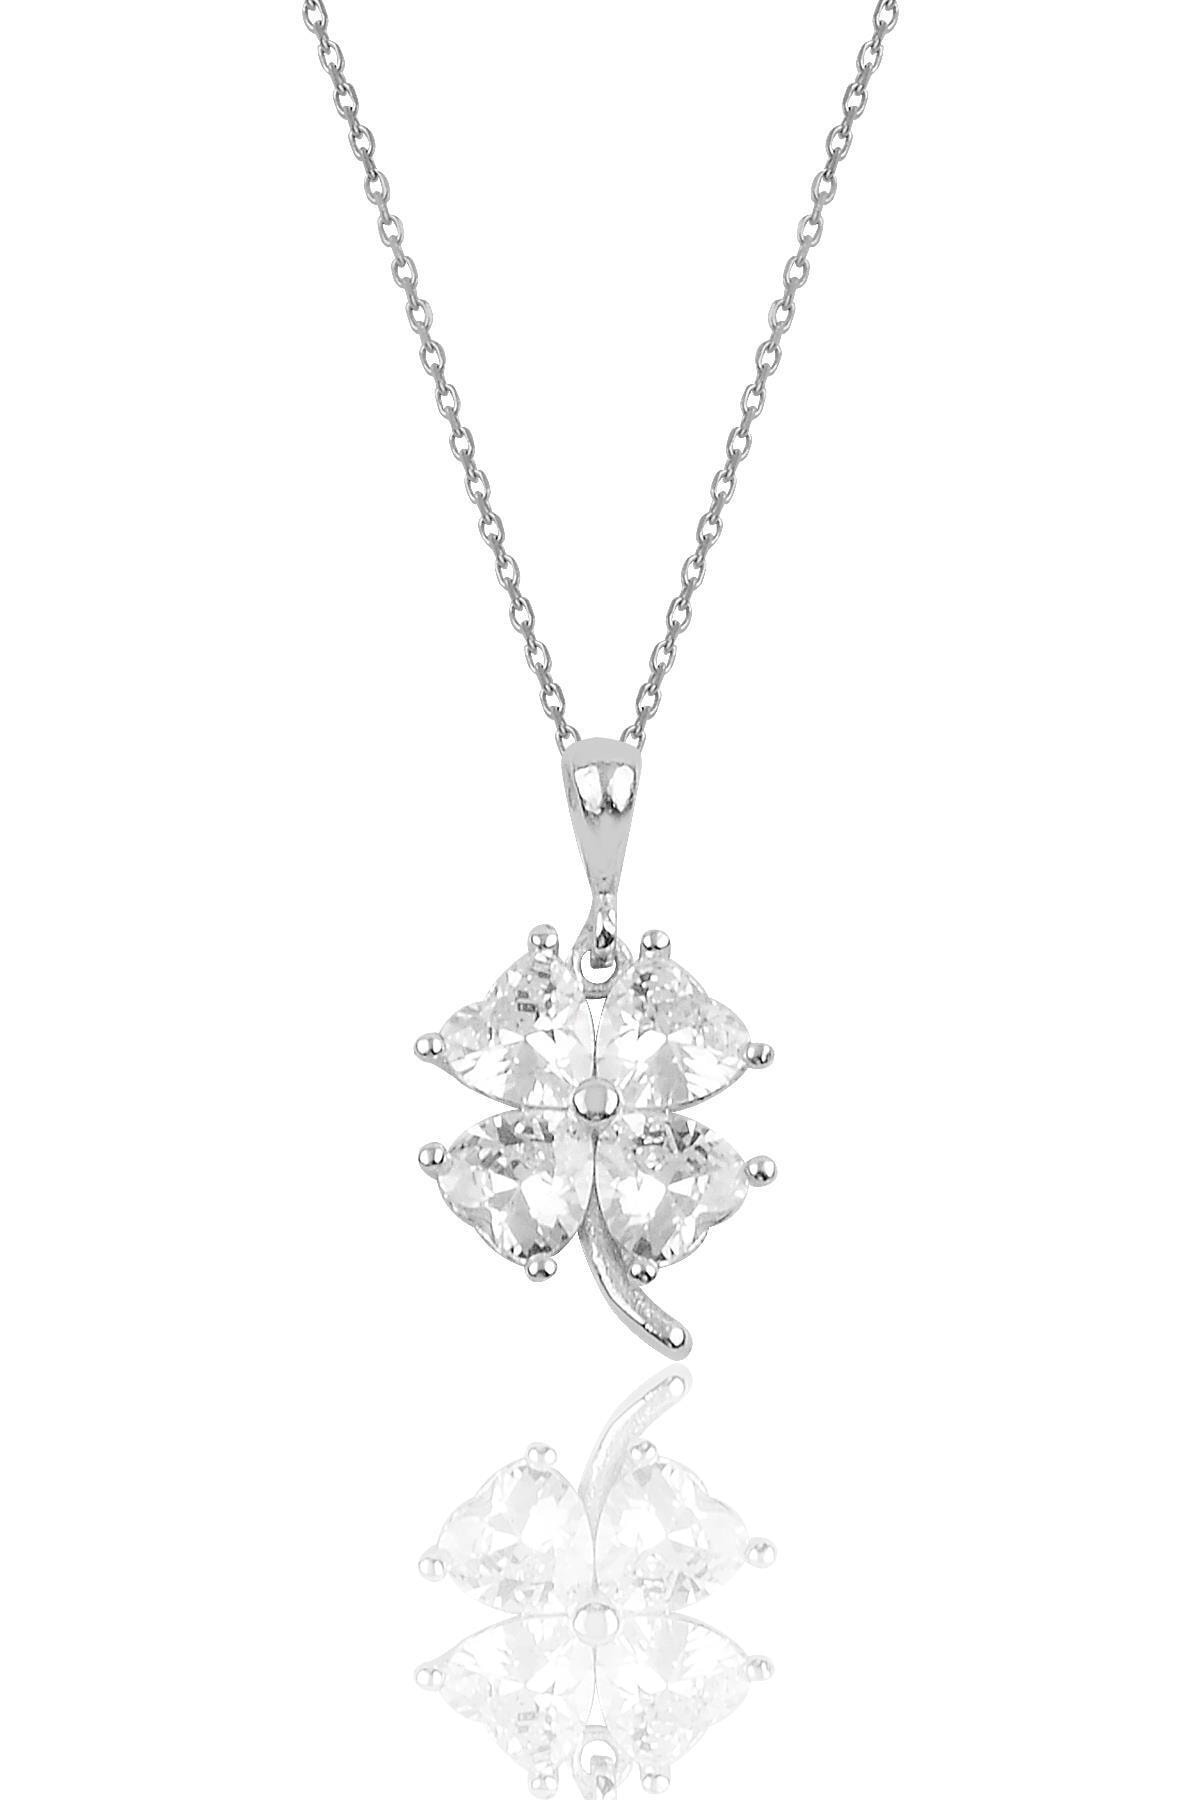 Söğütlü Silver Gümüş Zirkon Taşlı Yonca Modeli Kolye Sgtl10089beyaz 1